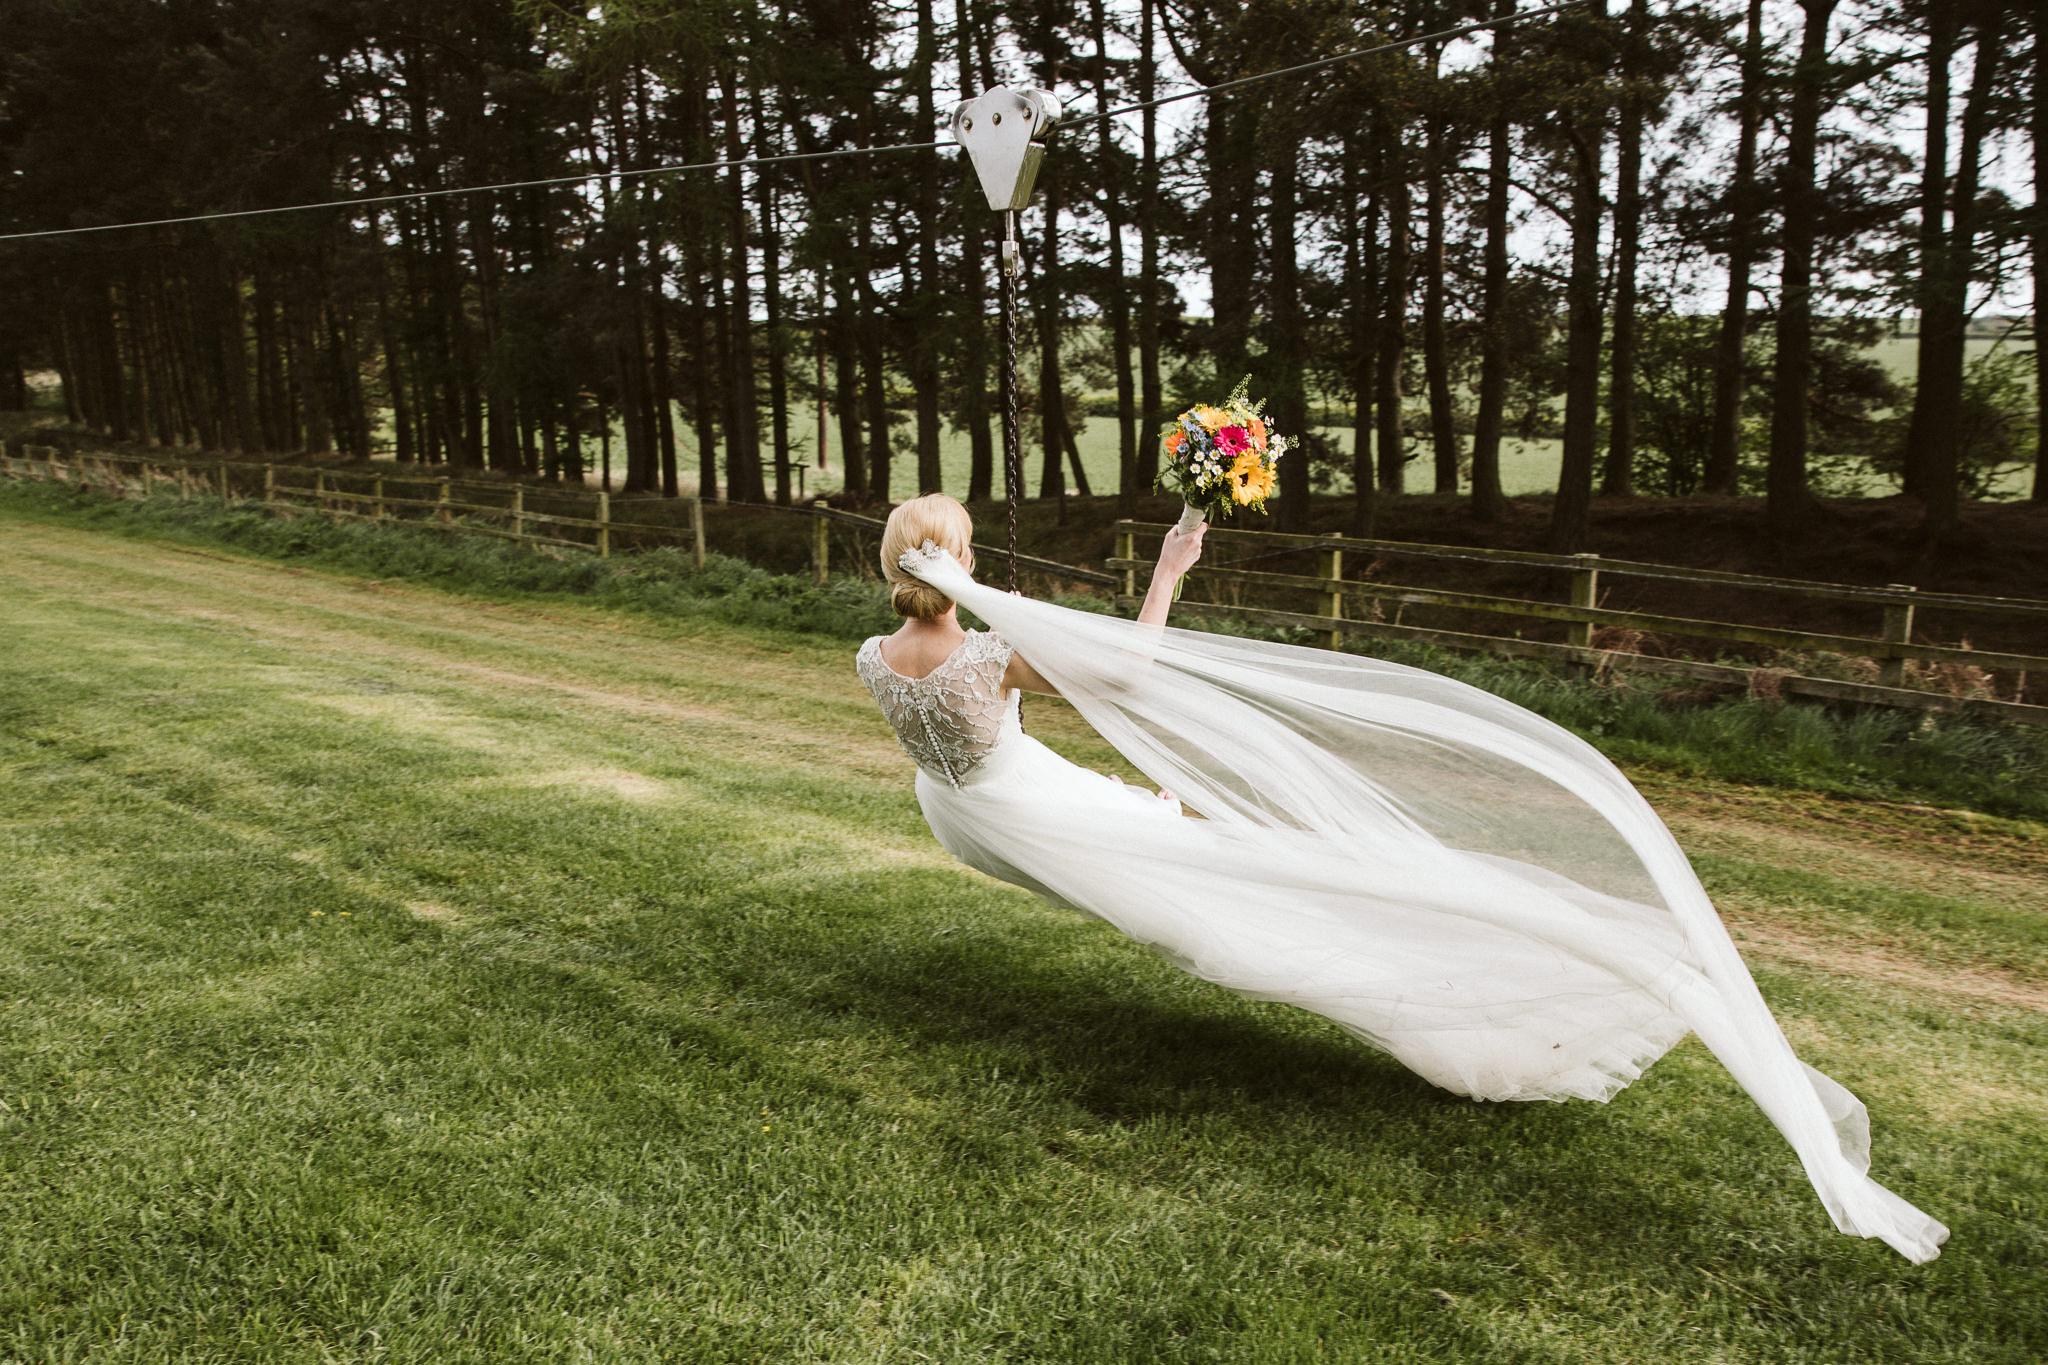 northside-farm-wedding-northumberland-margarita-hope (89).jpg